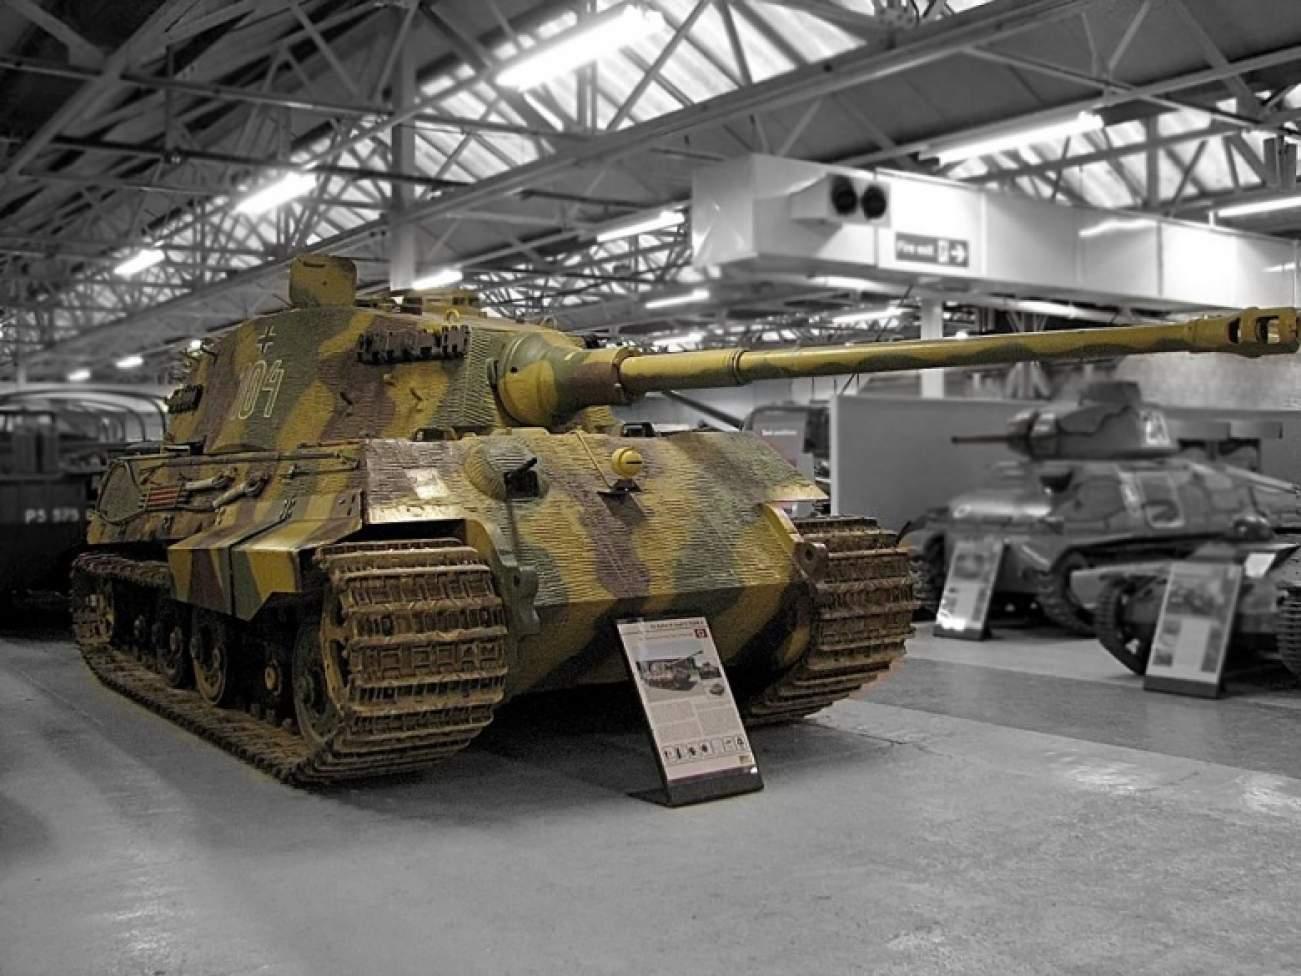 Nazi Germany's King Tiger Tank : Super Weapon or Super Myth